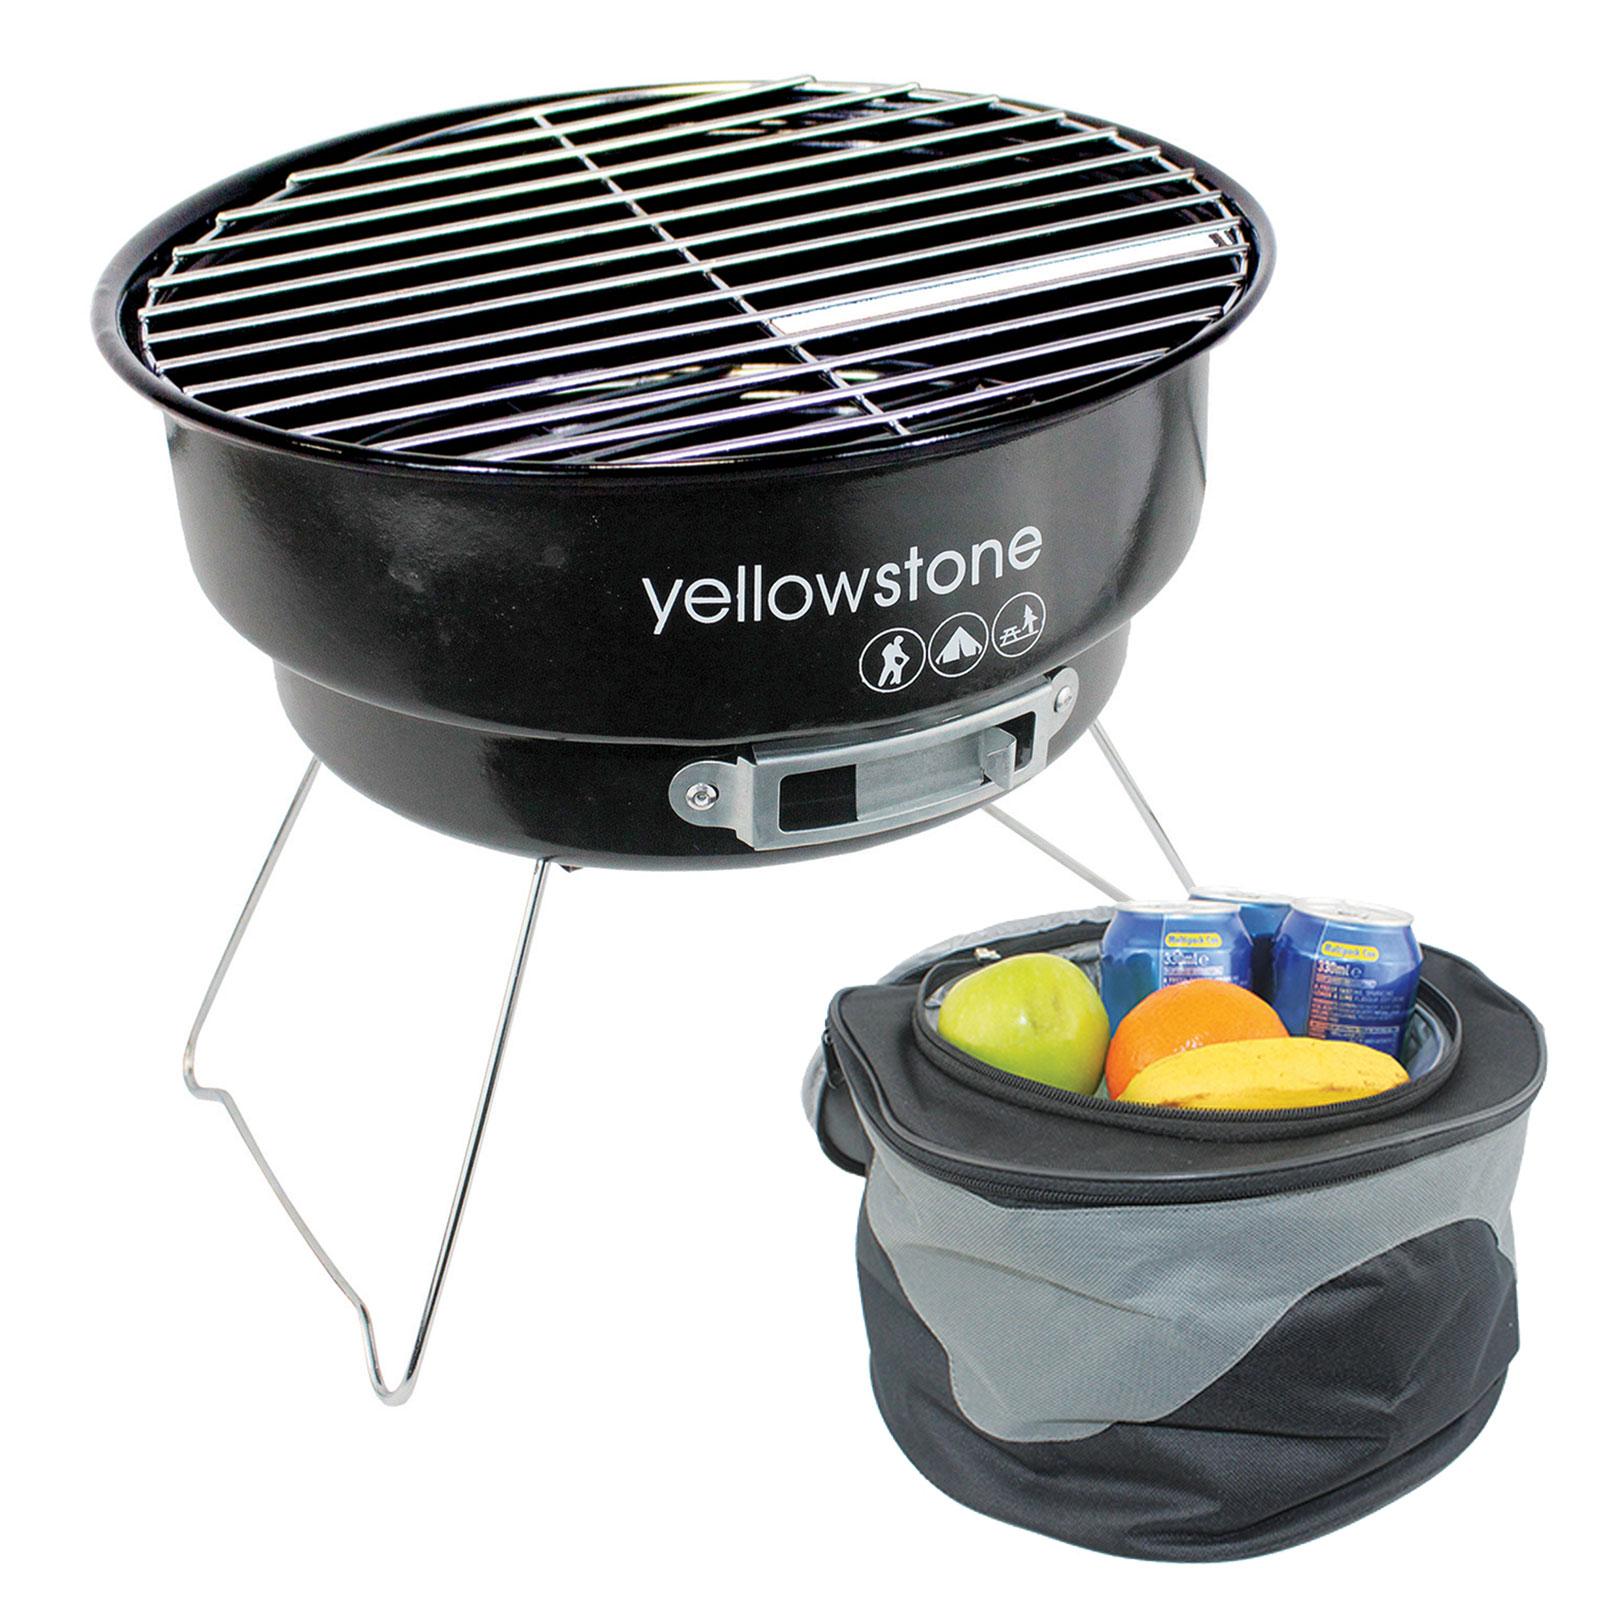 YELLOWSTONE BBQ Compact Minigrill Camping Rund Grill Klapp Kohle ...